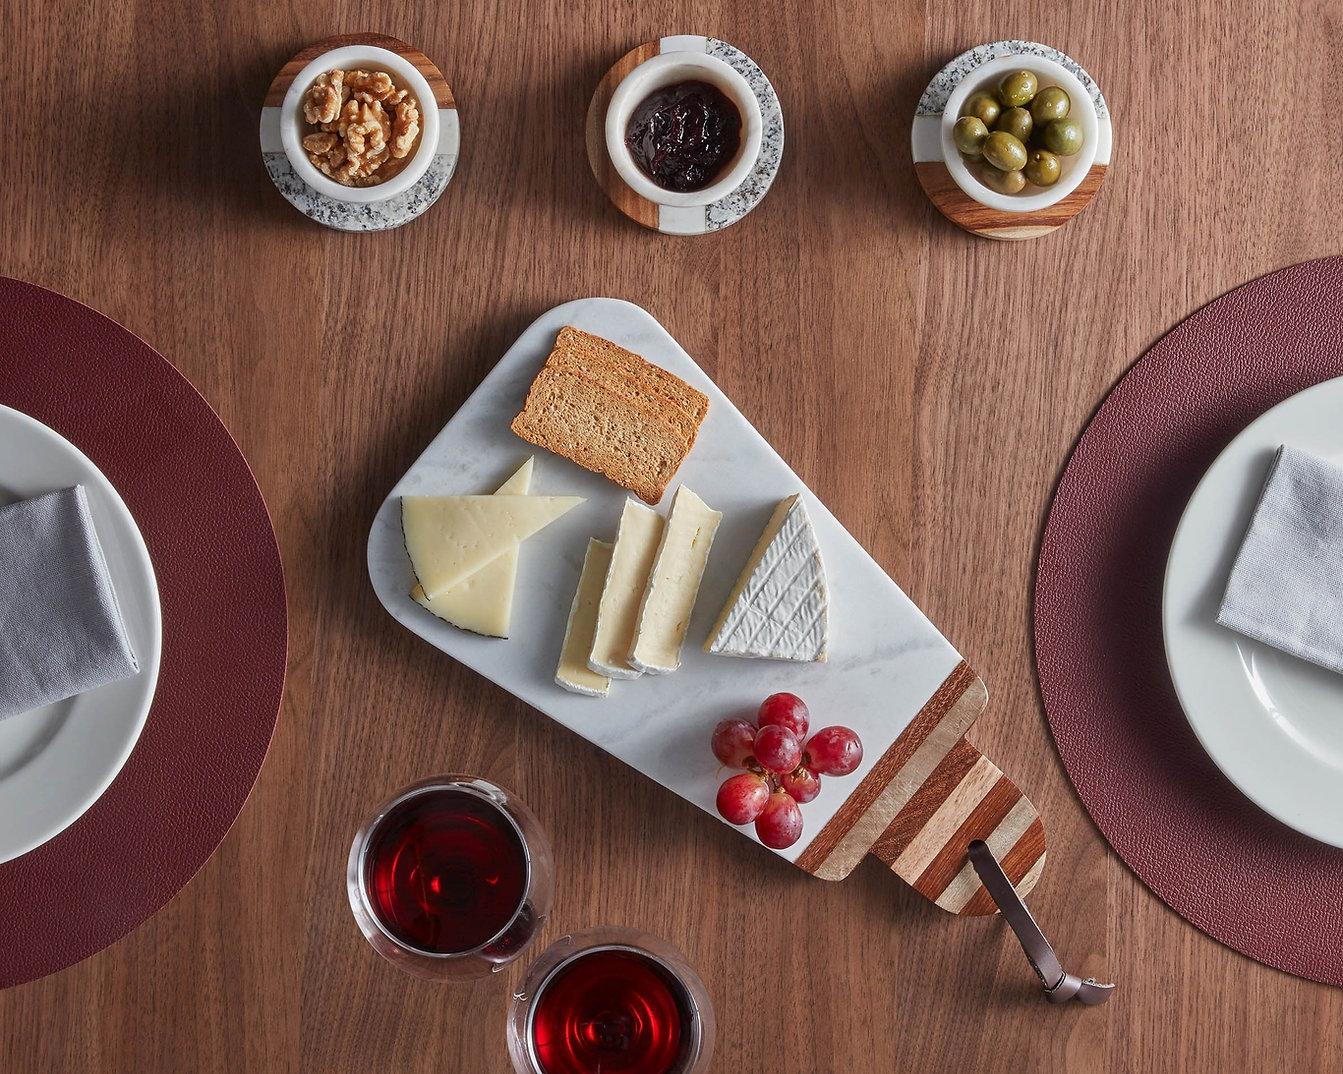 Tablas Kave Home (Gadgets & Home) - GastroMadrid